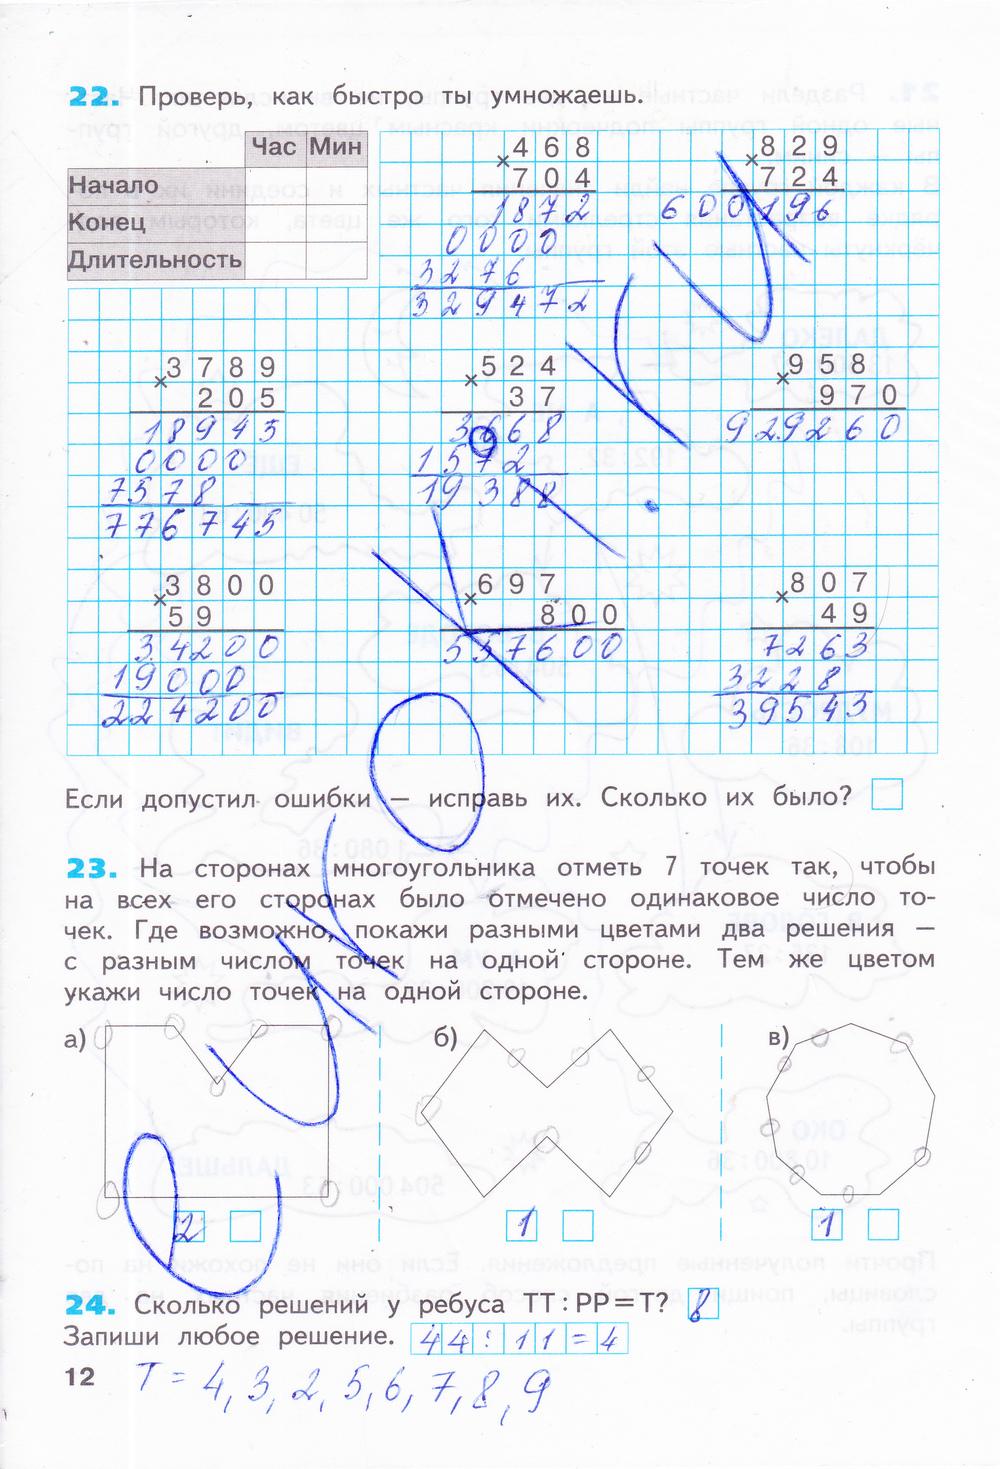 Домашнее задание по икт 3 класс бененсон паутова